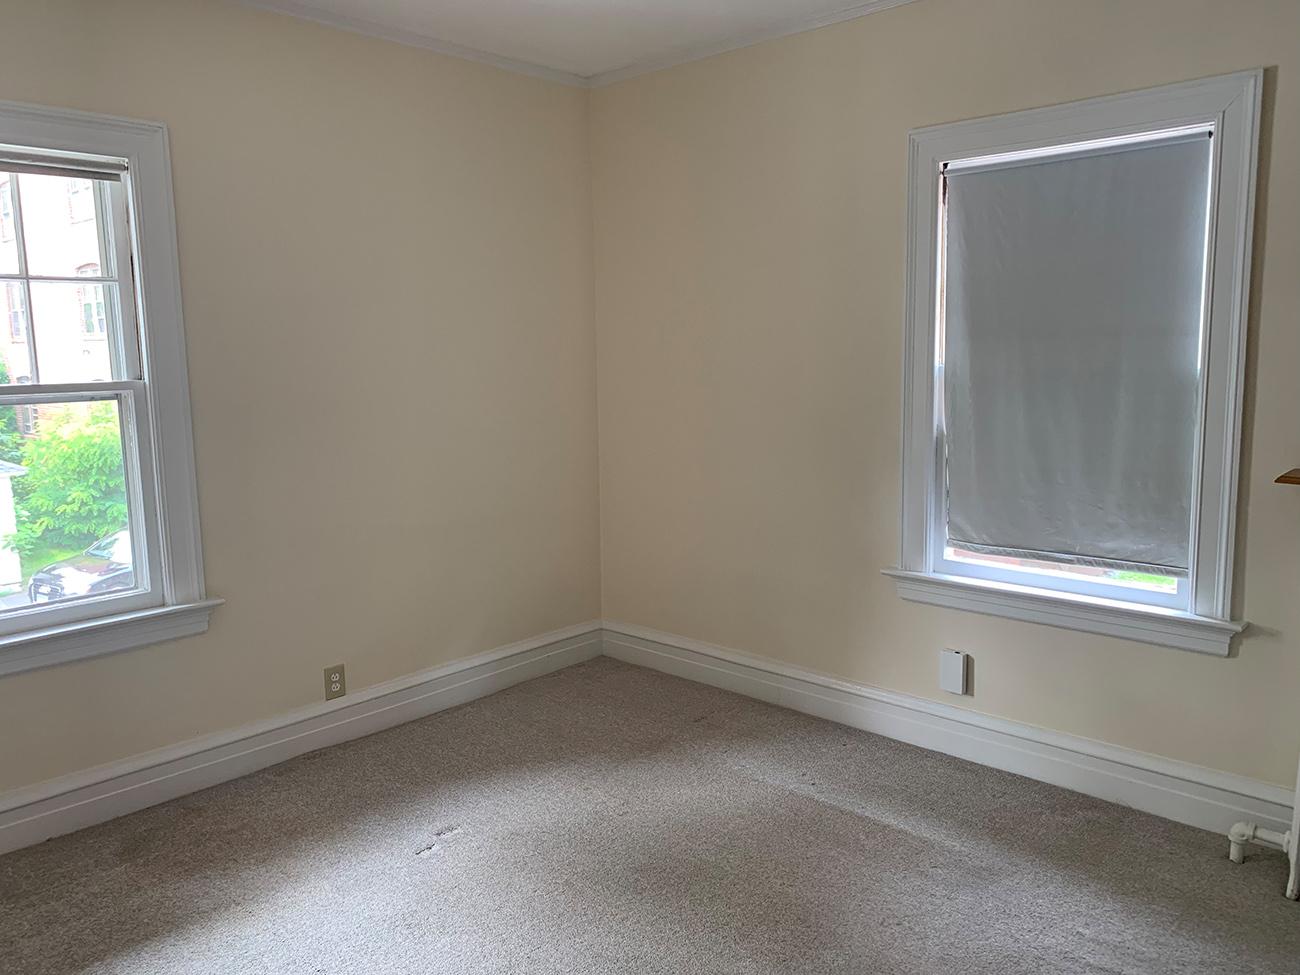 HFI Interior office, empty